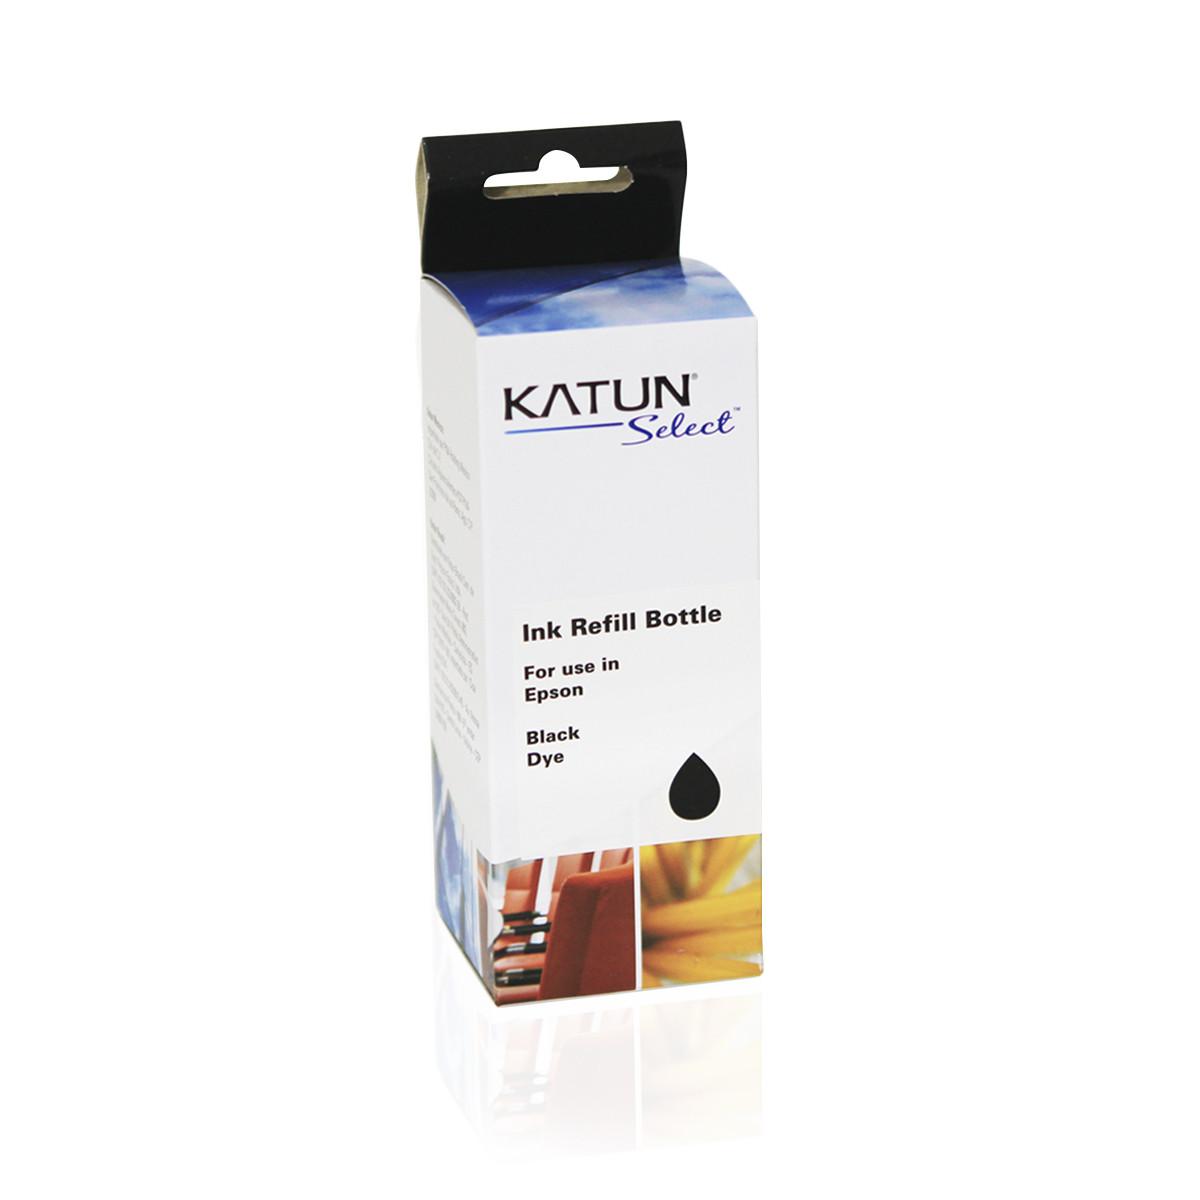 Tinta Compatível com Epson T504 T504120 Preto   L4150 L4160 L6171 L6191 L6161   Katun Select 127ml